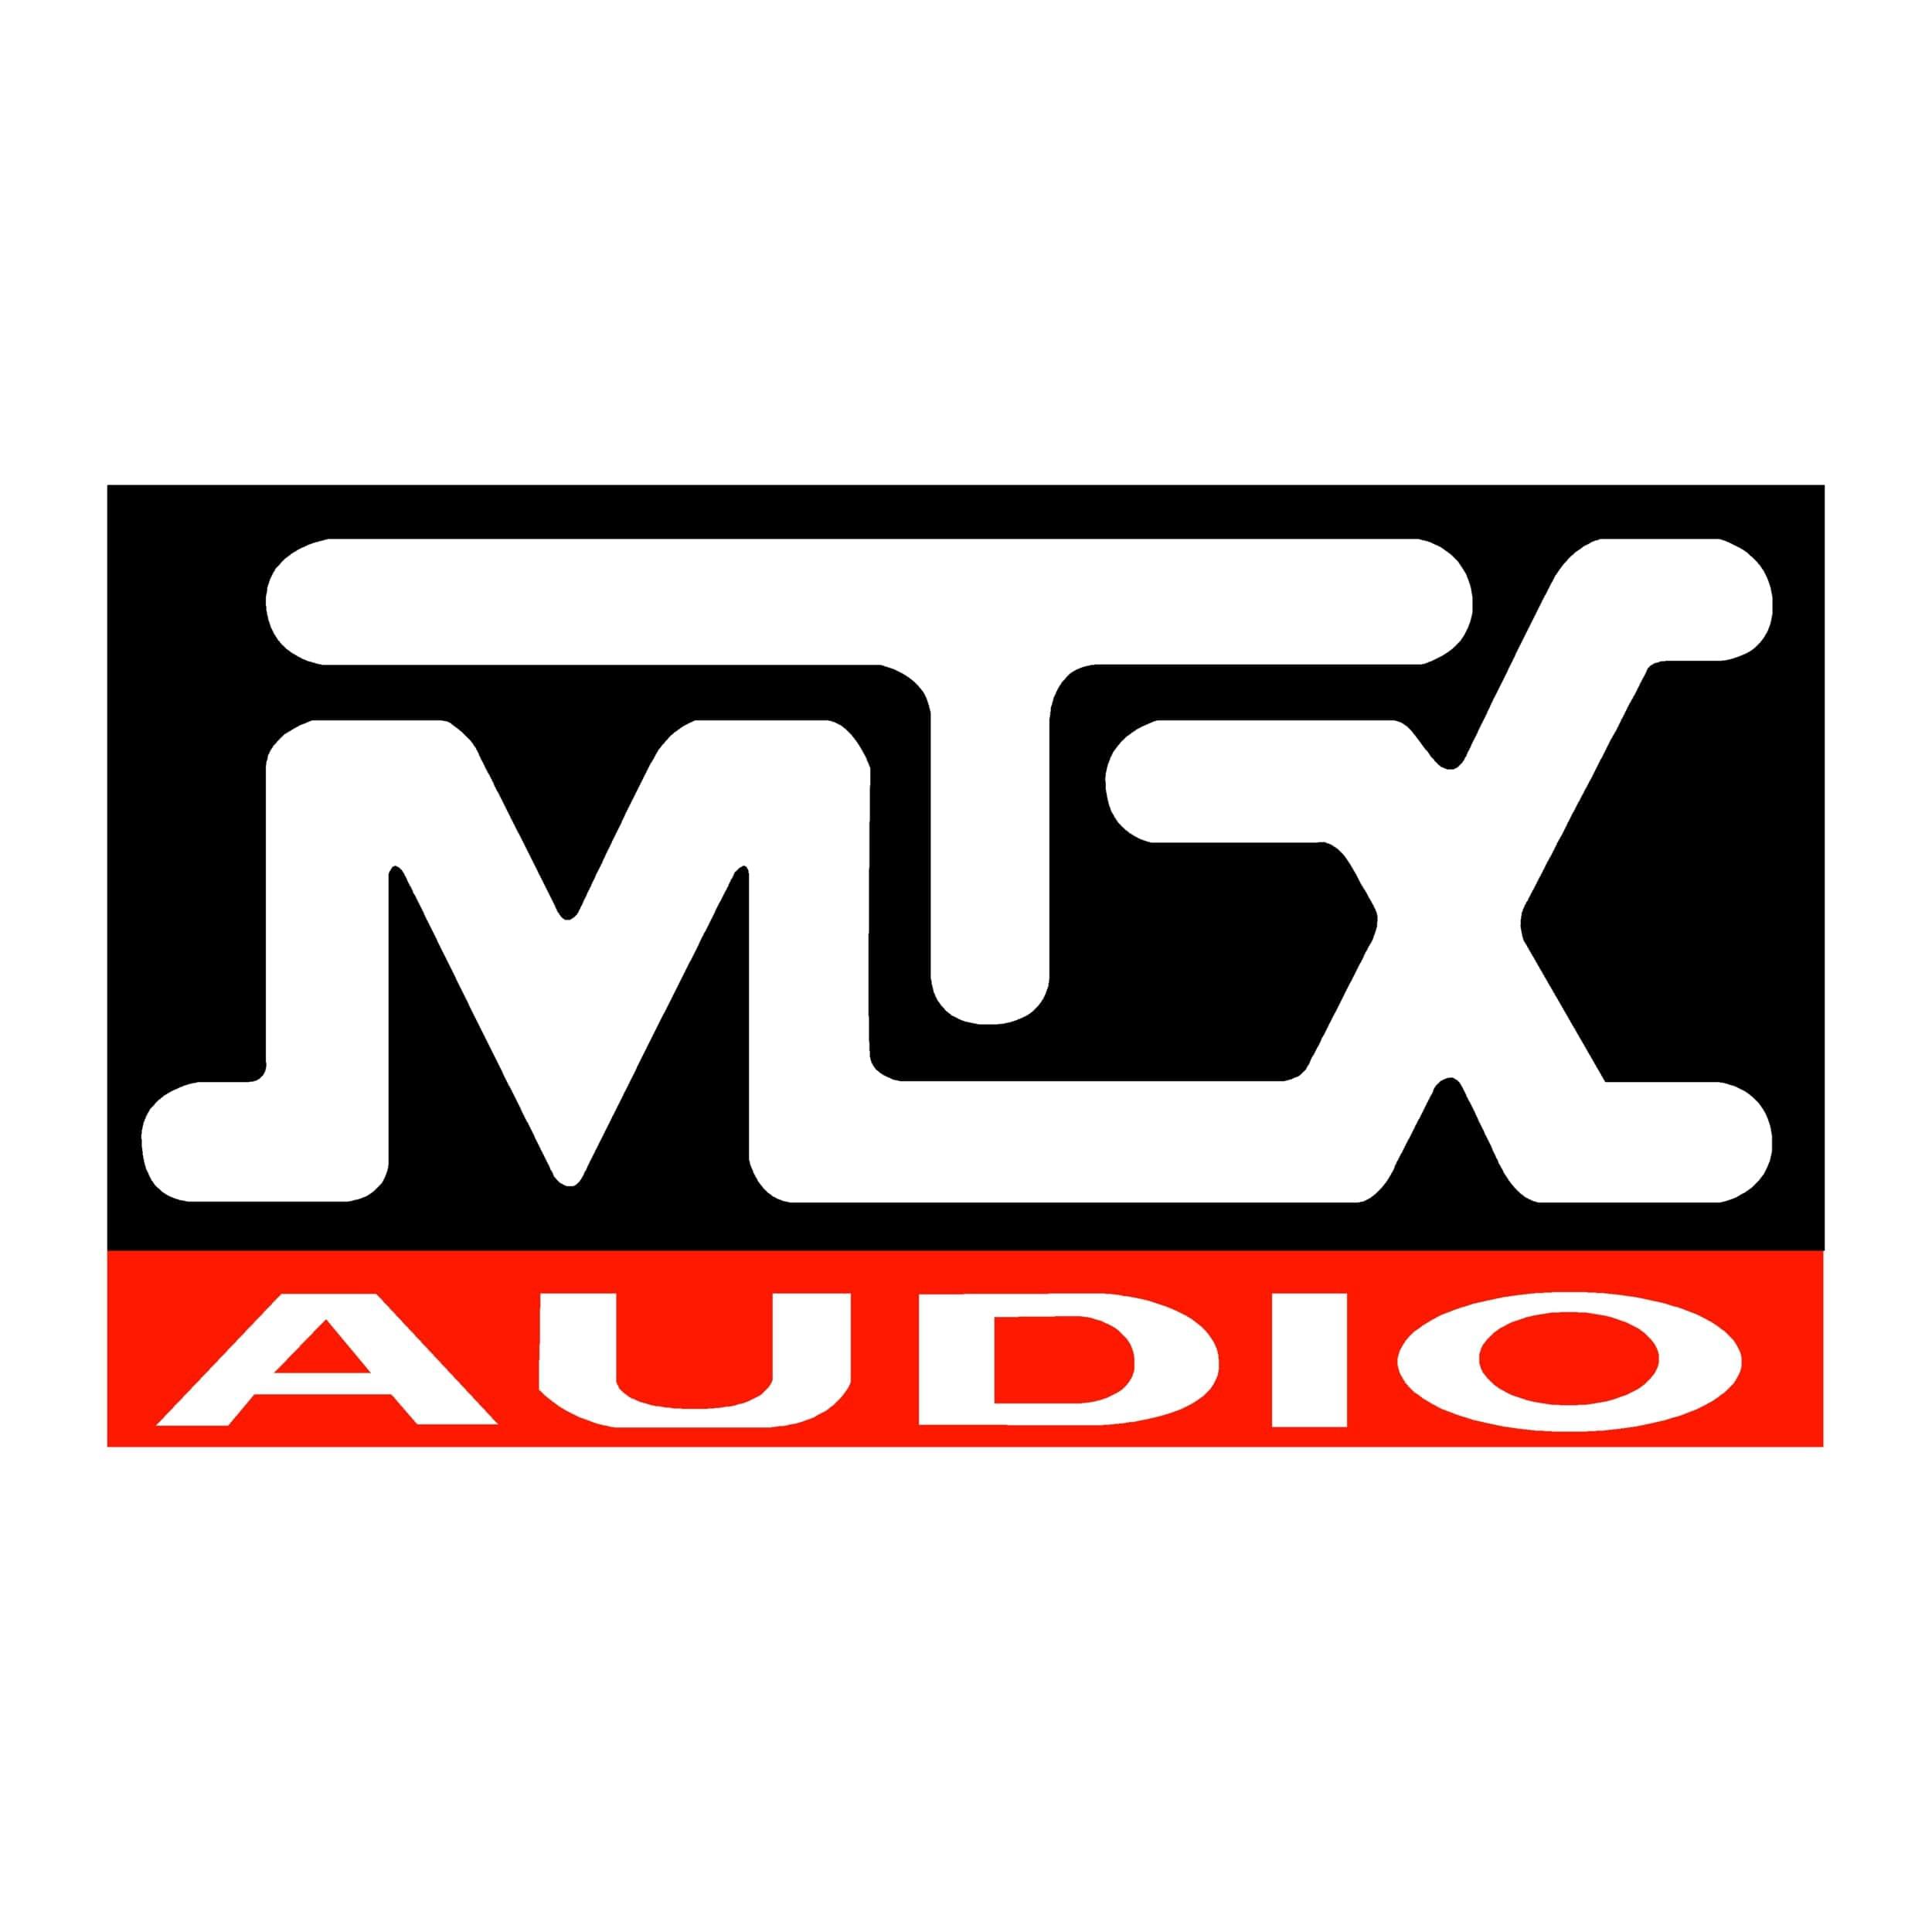 stickers-mtx-ref-3-tuning-audio-4x4-sonorisation-car-auto-moto-camion-competition-deco-rallye-autocollant-min